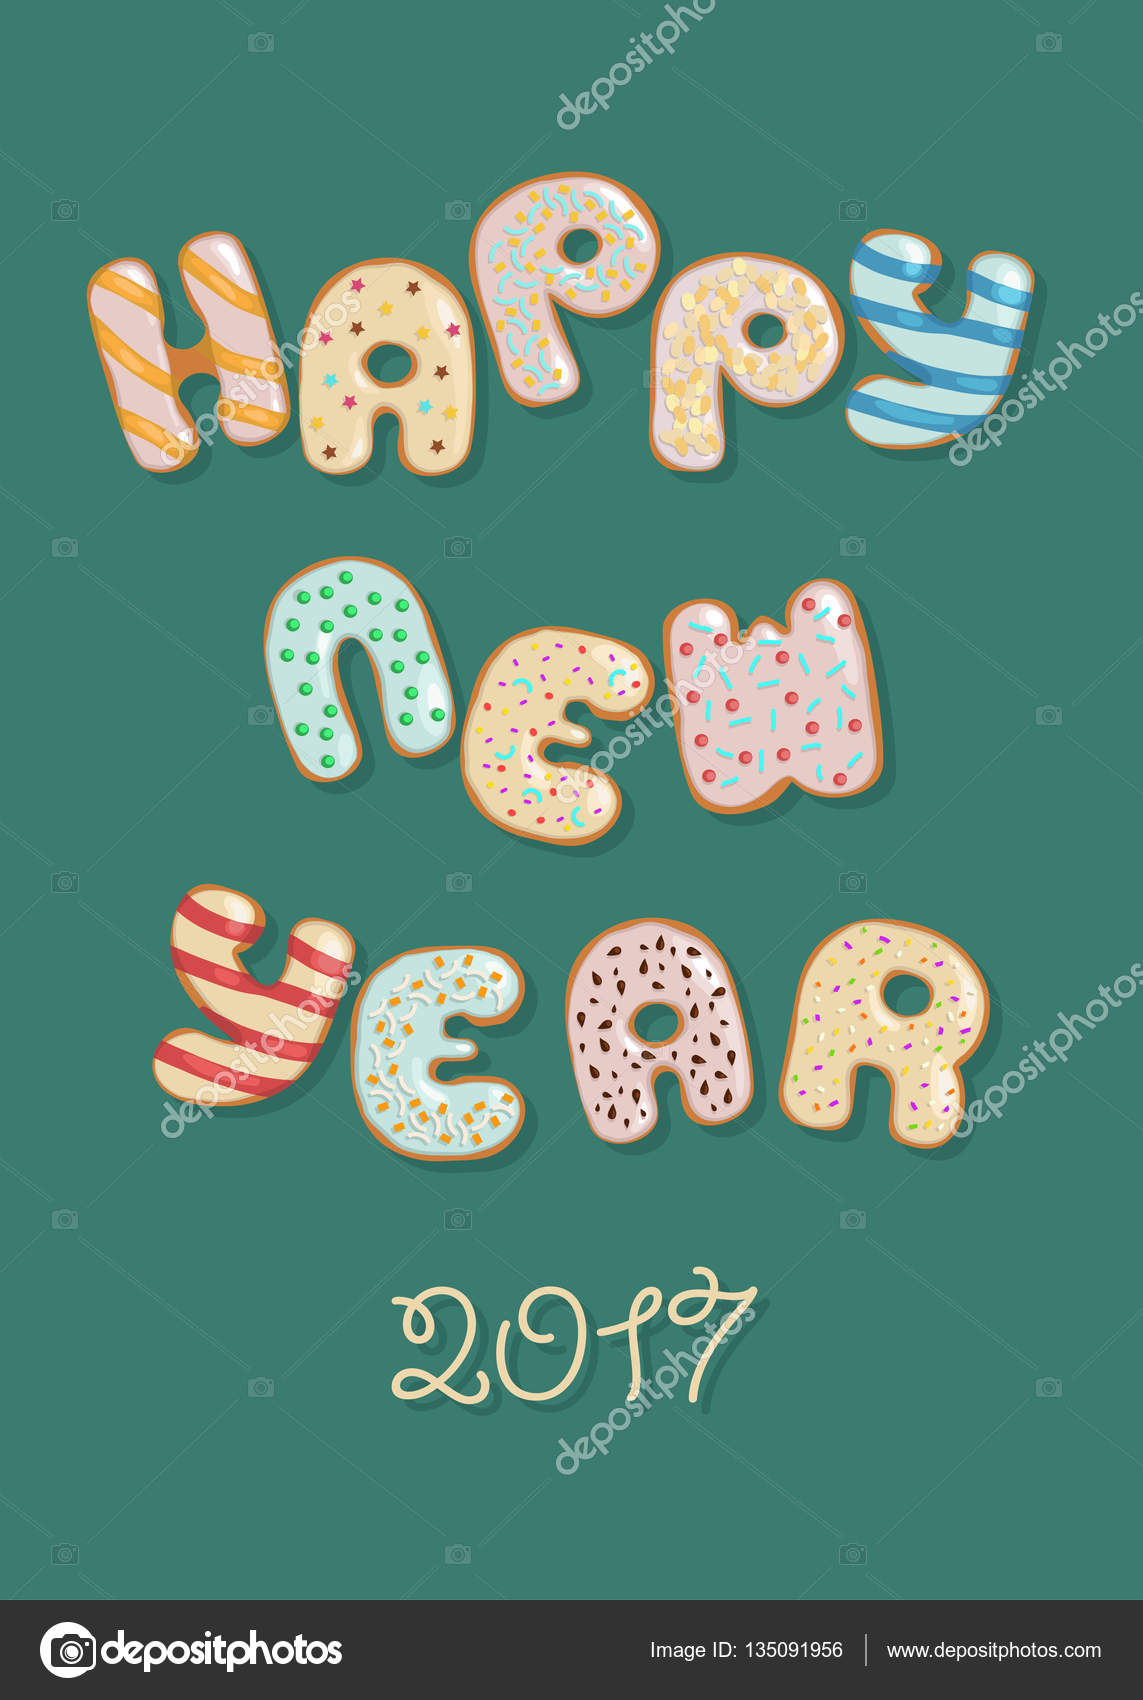 happy new year 2017 sweet donuts stock photo